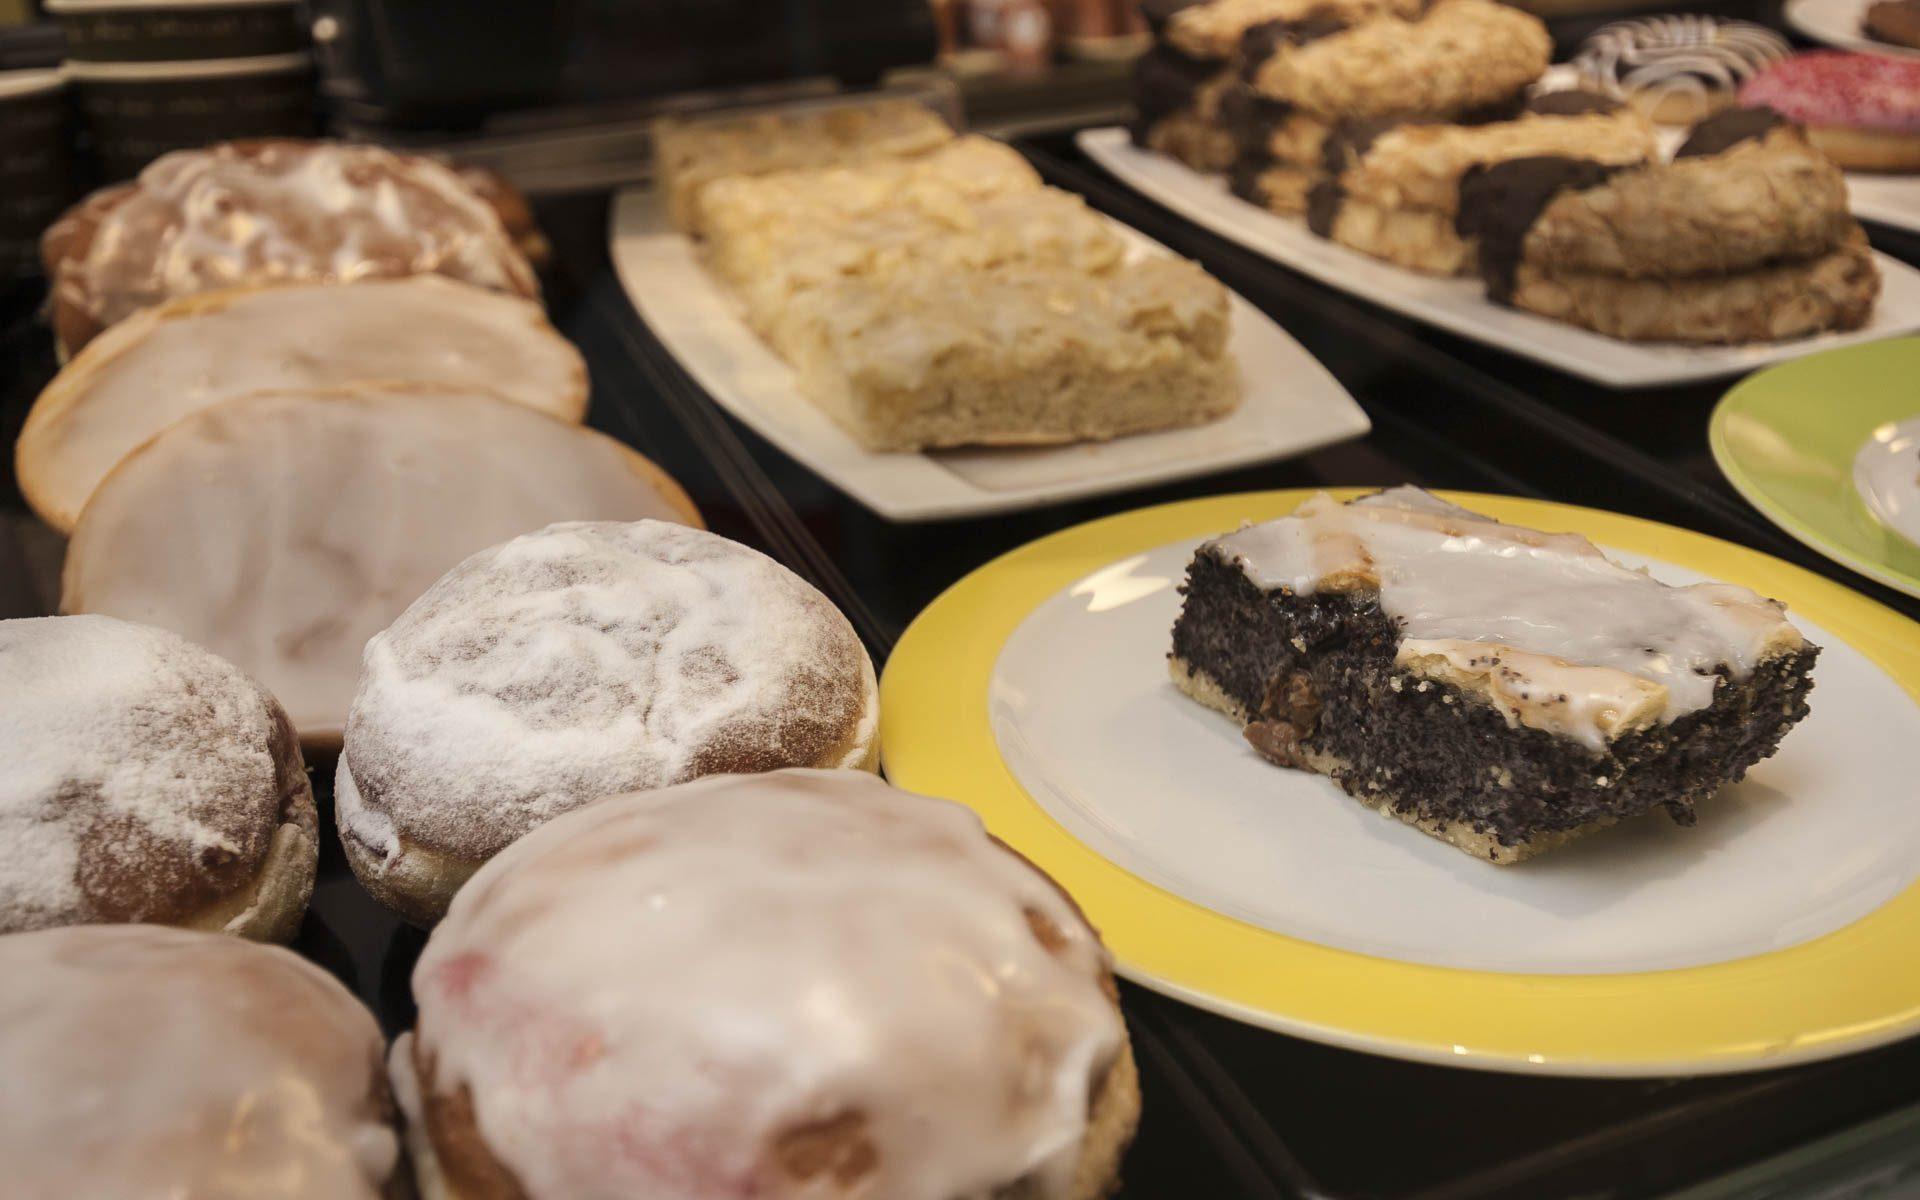 Wally's – Kuchen, Berliner, Mandelhörnchen